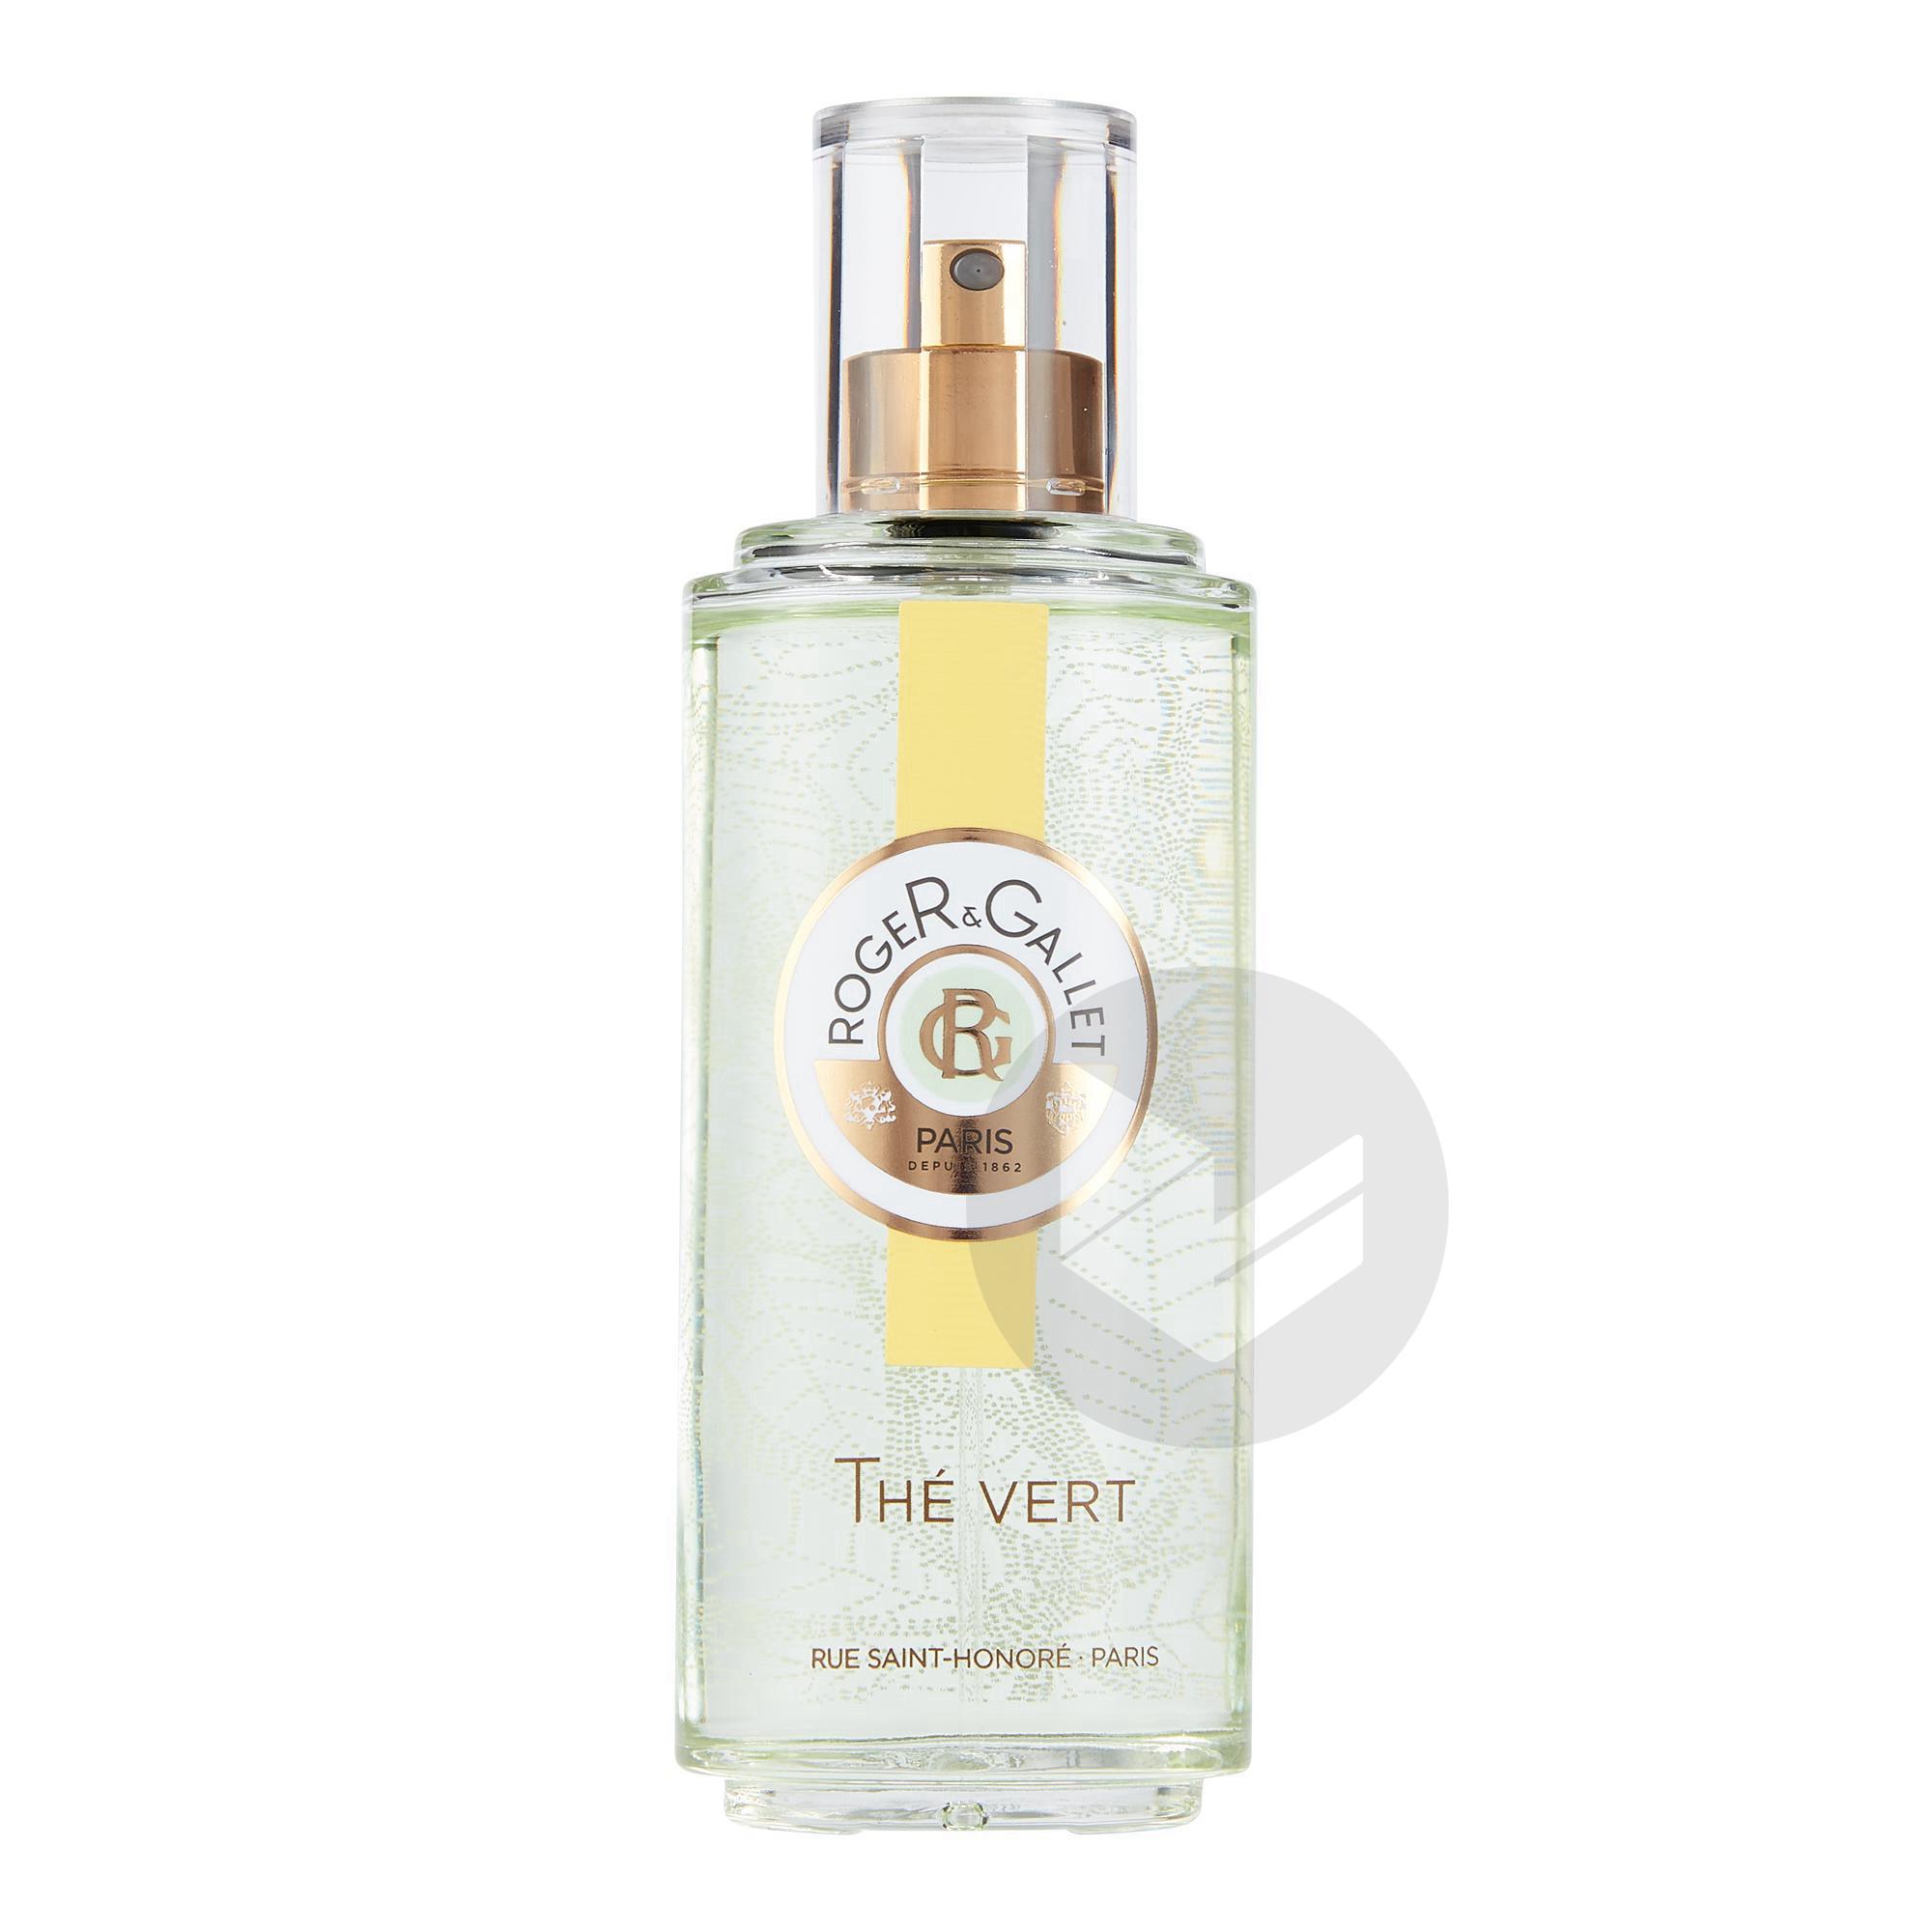 The Vert Eau Fraiche Parfumee Bienfaisante Vaporisateur 100 Ml